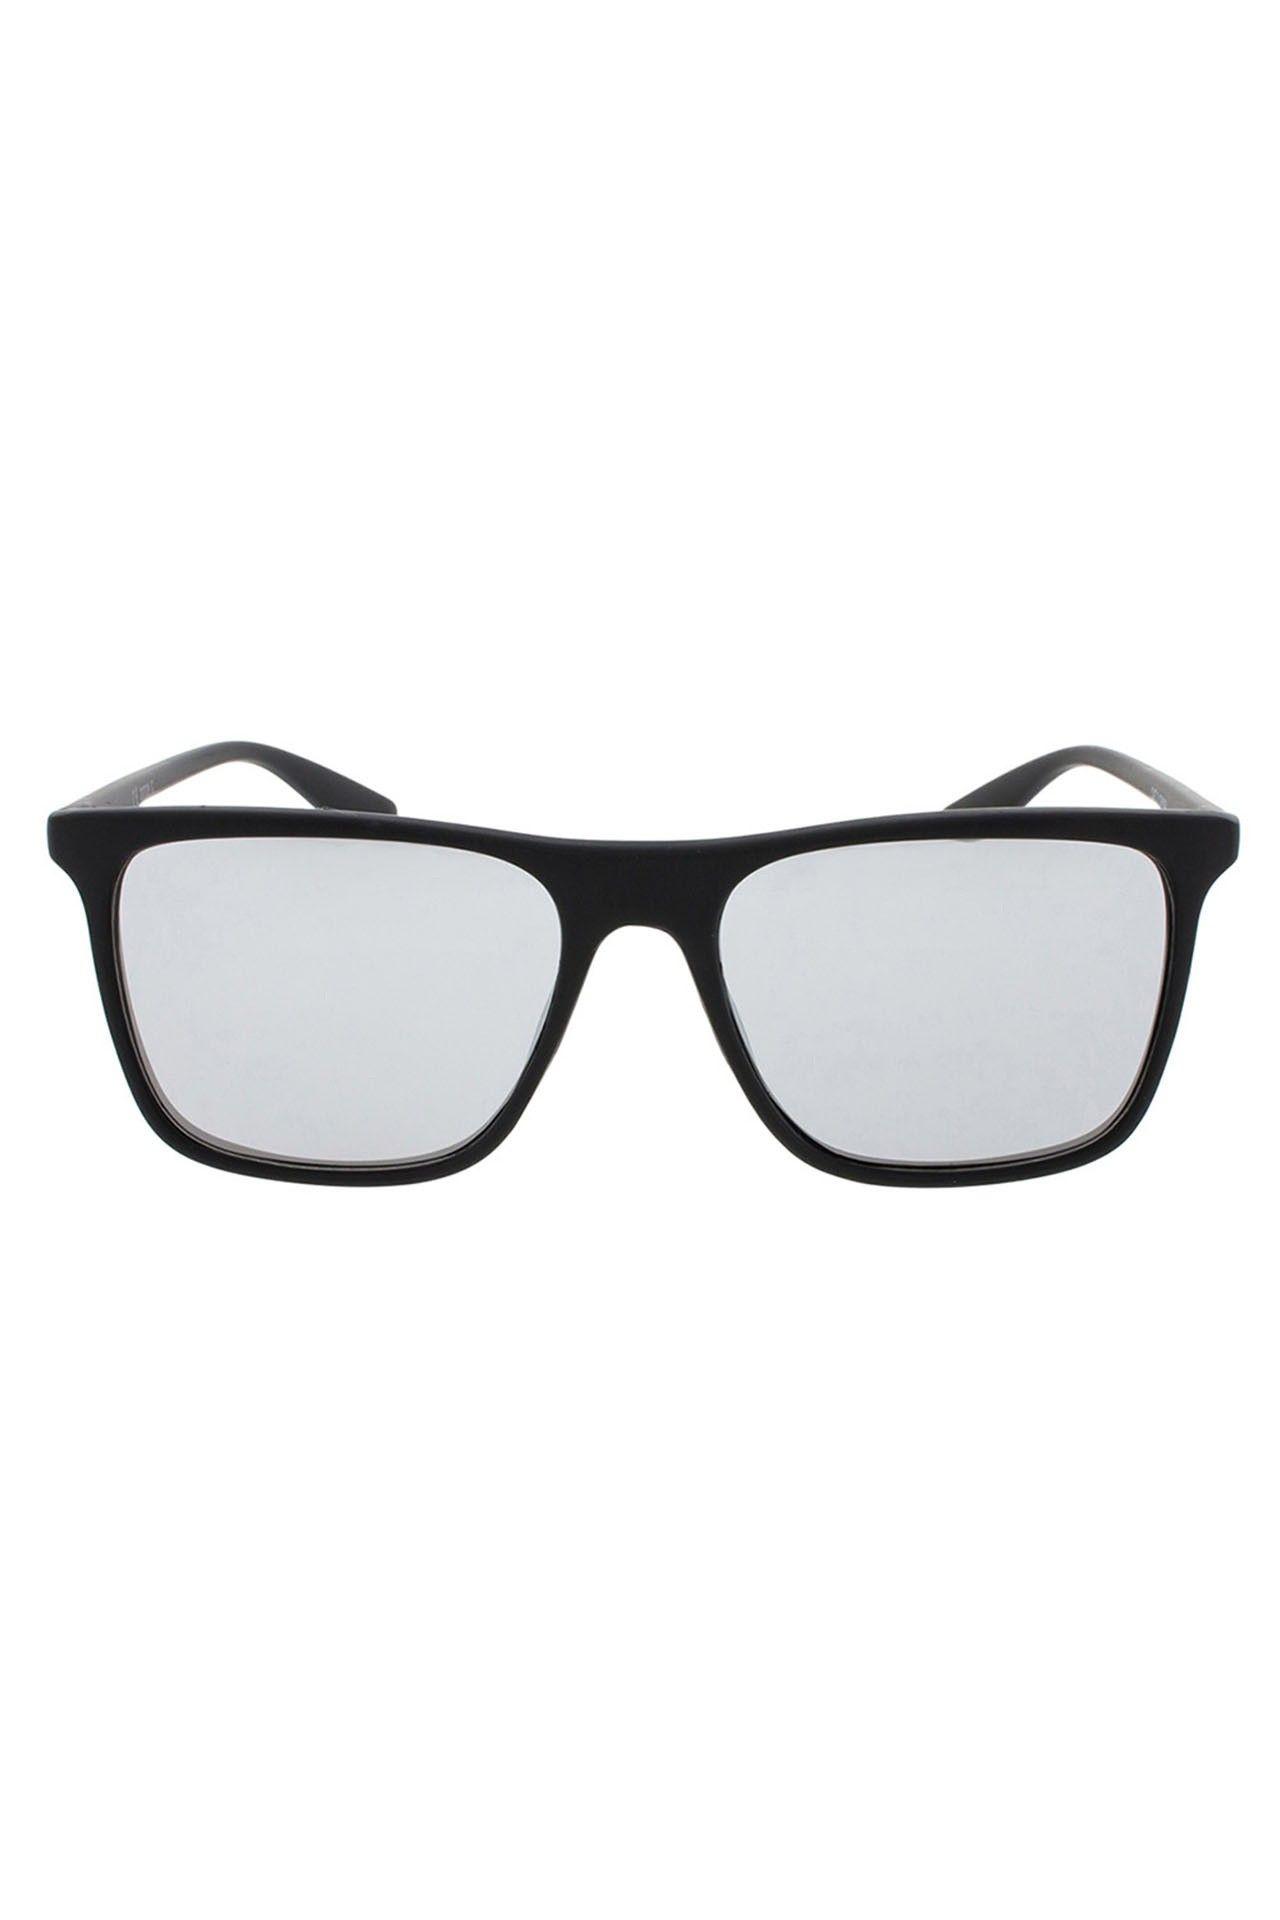 Afbeelding van Icon Eyewear Zonnebril 20728 Matt Black C